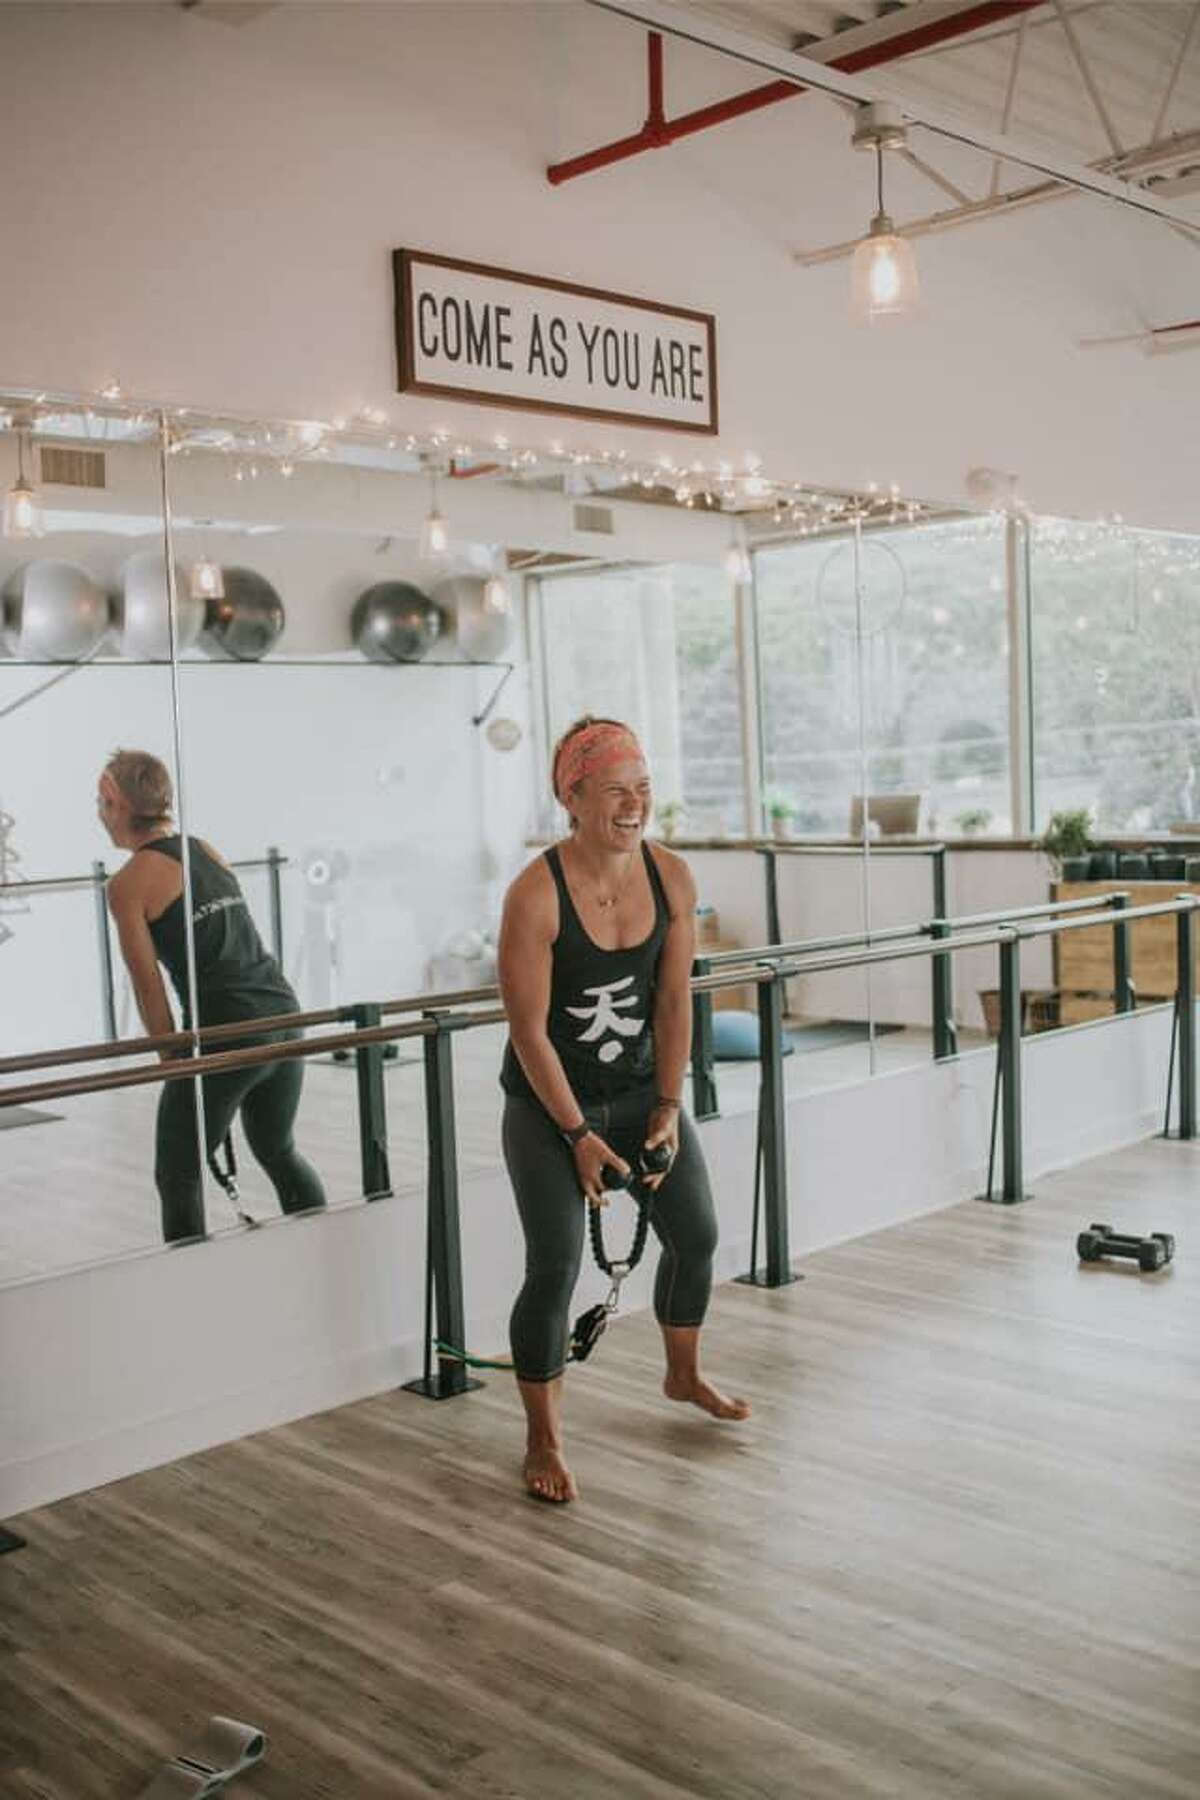 Owner Emily Medonis at Akasa fitness and wellness studio in Thomaston